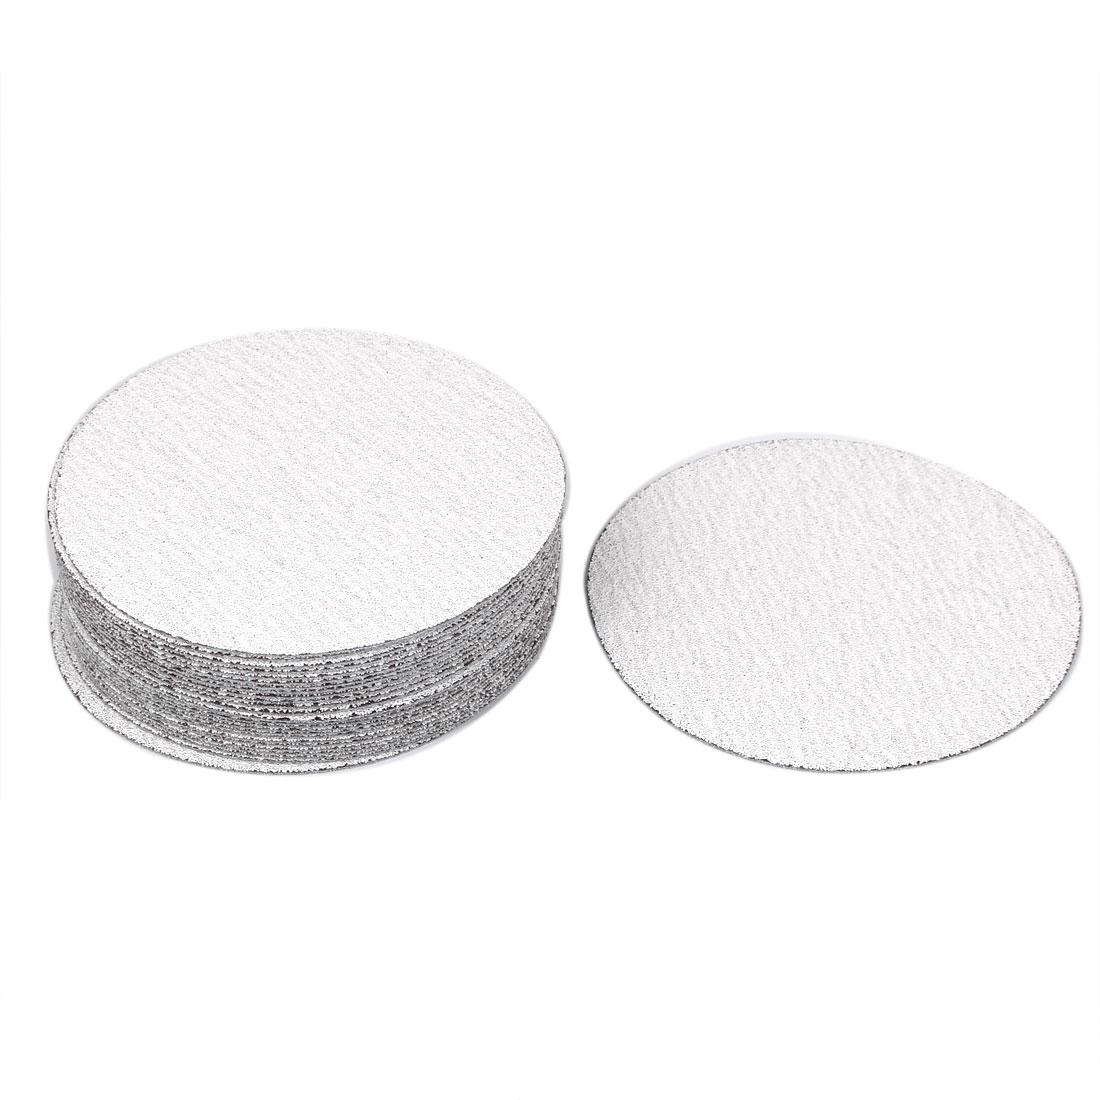 "5"" Dia Polishing Round Dry Abrasive Sanding Sandpaper Sheet Disc 80 Grit 30 Pcs"